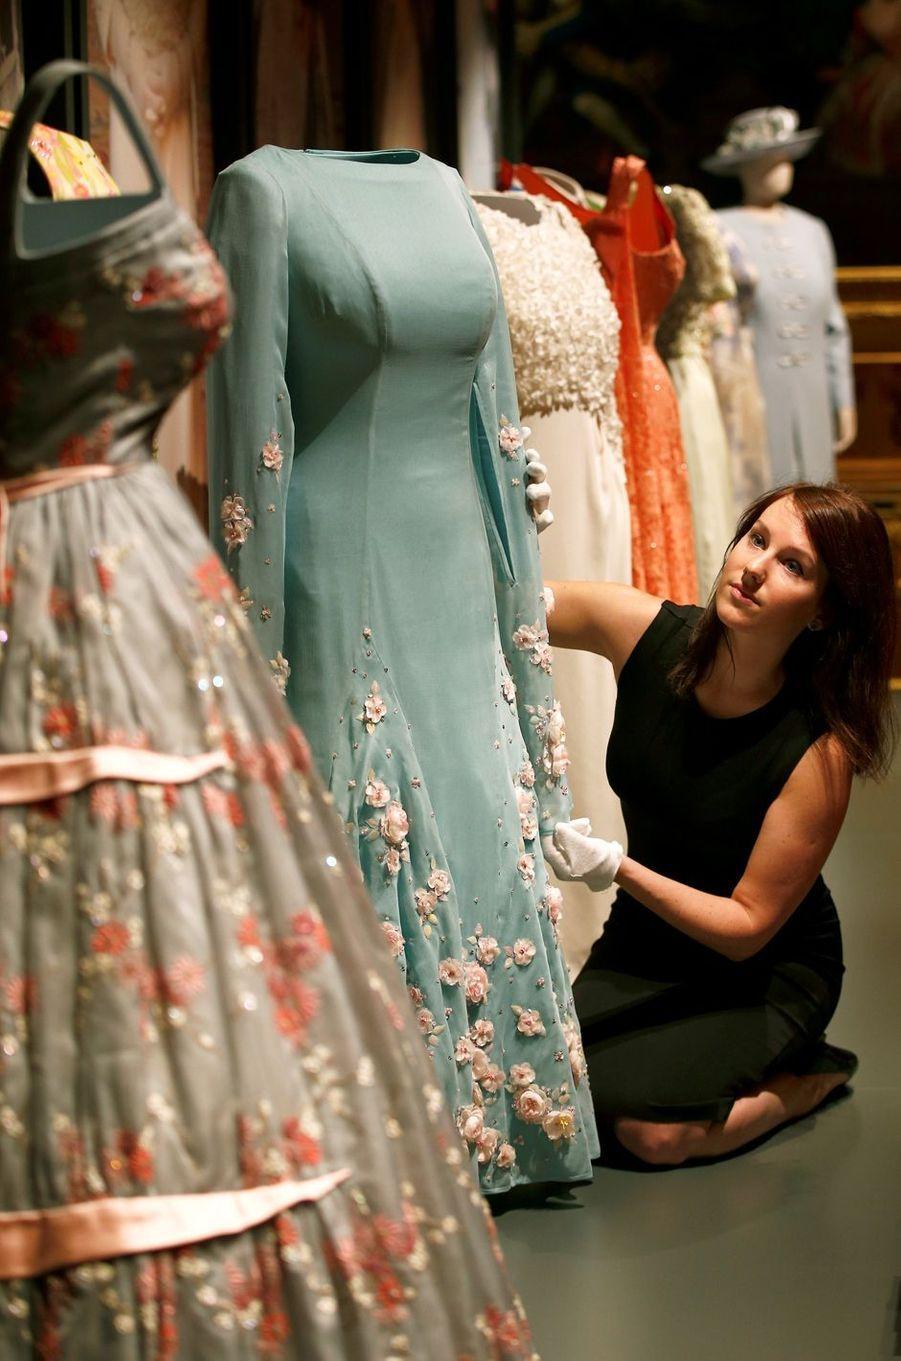 Exposition de la garde-robe de la reine Elizabeth II au château de Windsor (17 septembre 2016-8 janvier 2017)